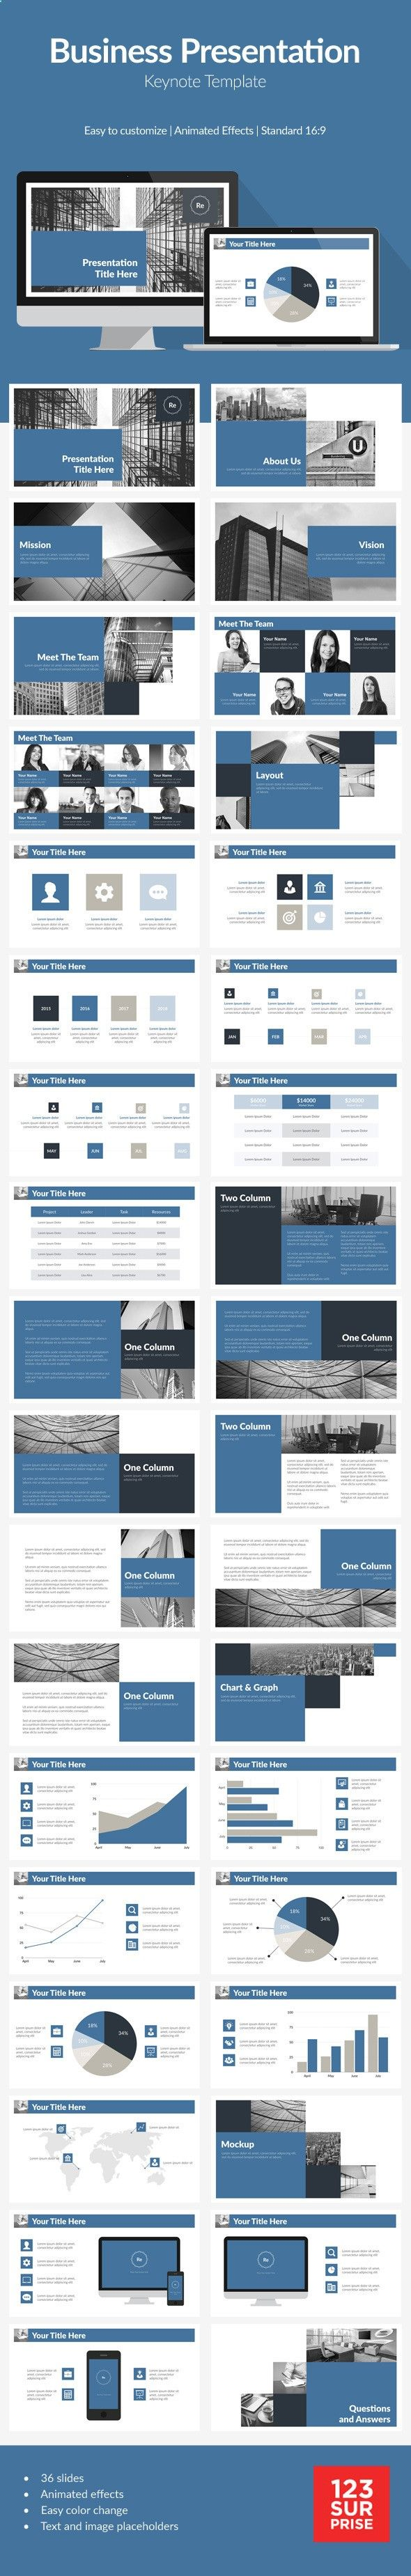 Blue Corporate Business Presentation Template #design #slides Buy Now: graphicriver.net/...